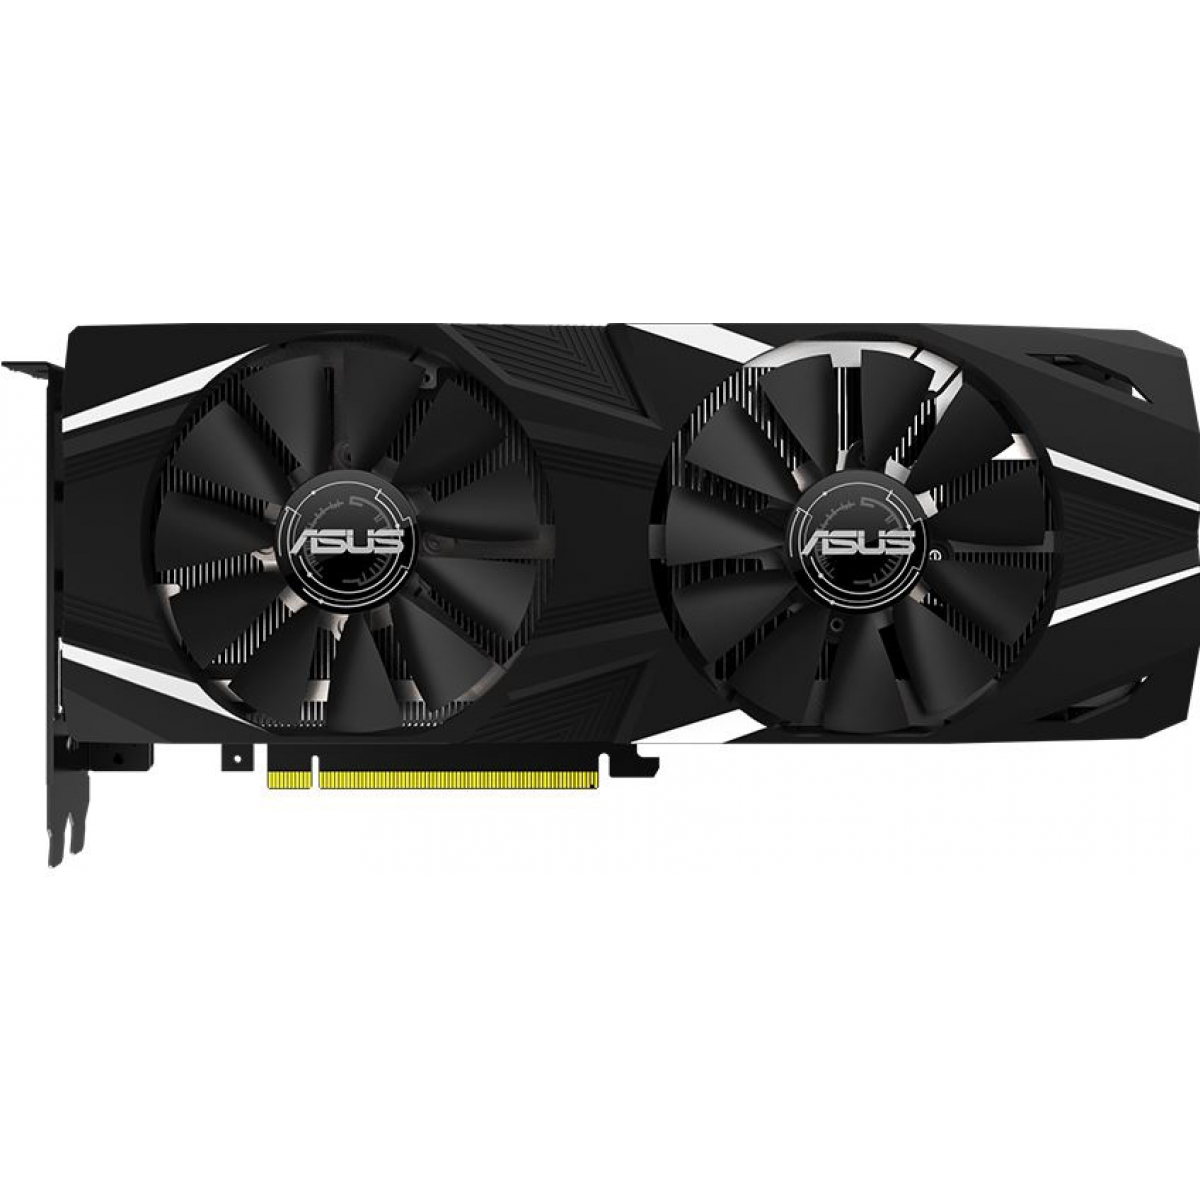 Placa de Vídeo Asus Geforce RTX 2080 Ti Dual, 11GB GDDR6, 352Bit, DUAL-RTX2080TI-A11G